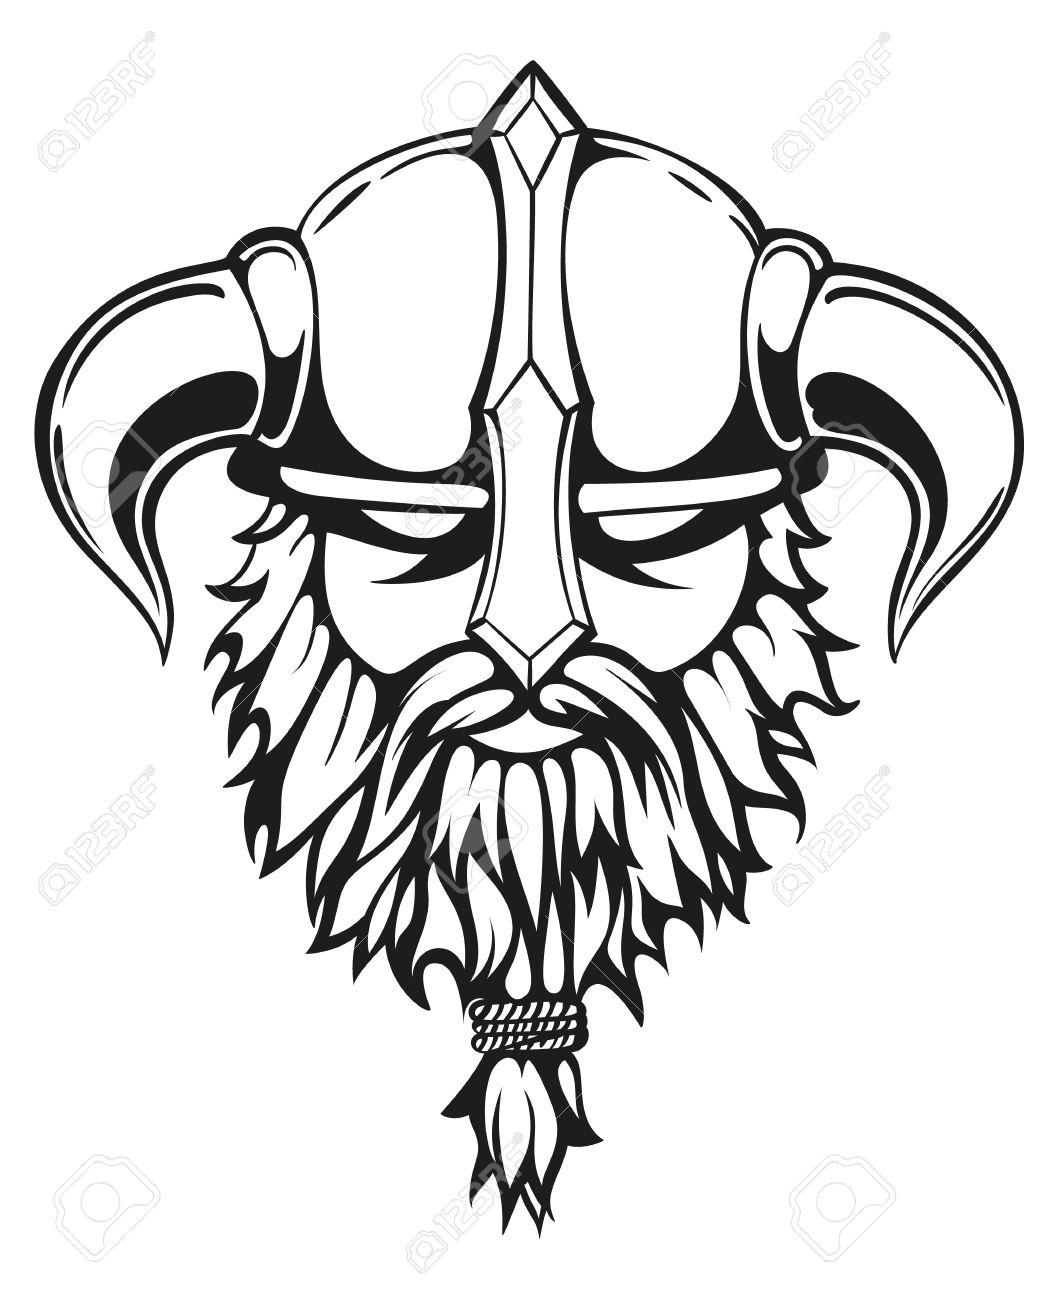 1058x1300 Brutal Viking Warrior Monochrome Contours Illustration. Viking